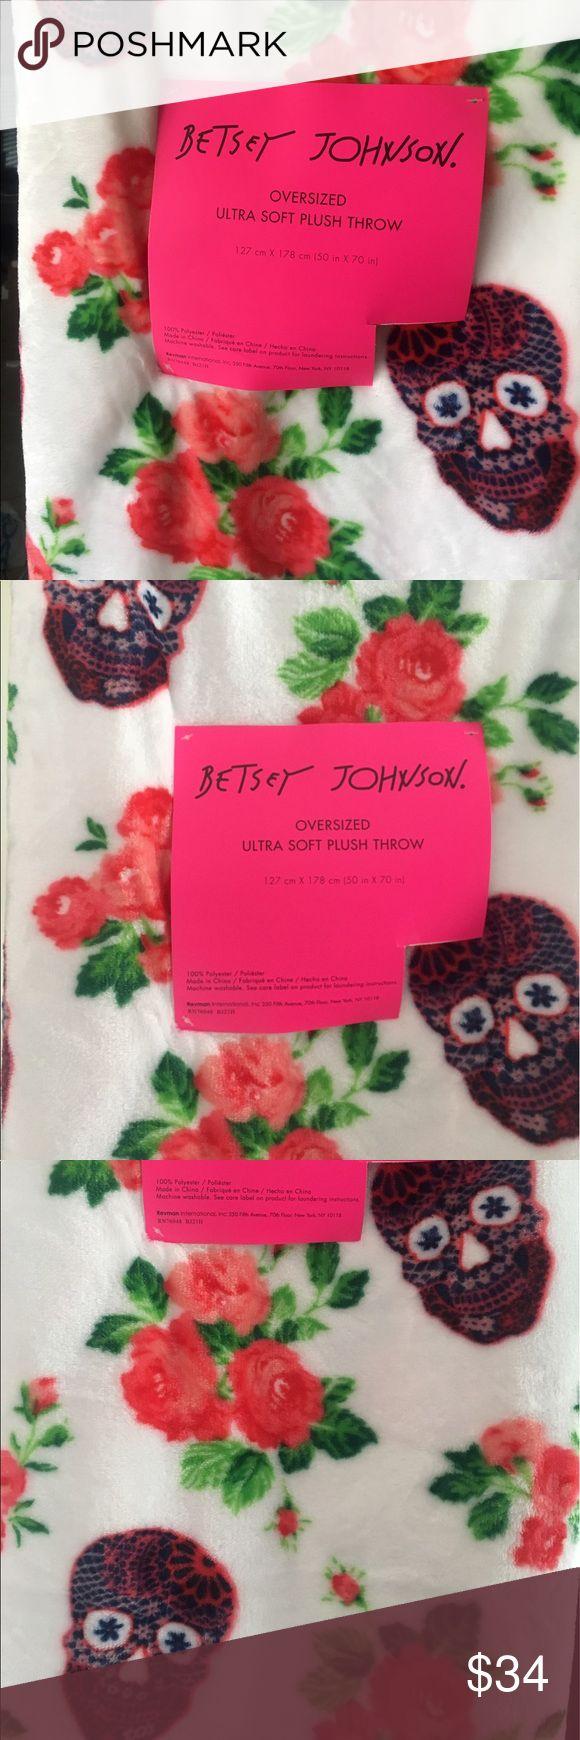 25 best ideas about skull carpet on pinterest purple sofa purple - Betsey Johnson Plush Blanket Throw Floral Skull Boutique Red Purplered